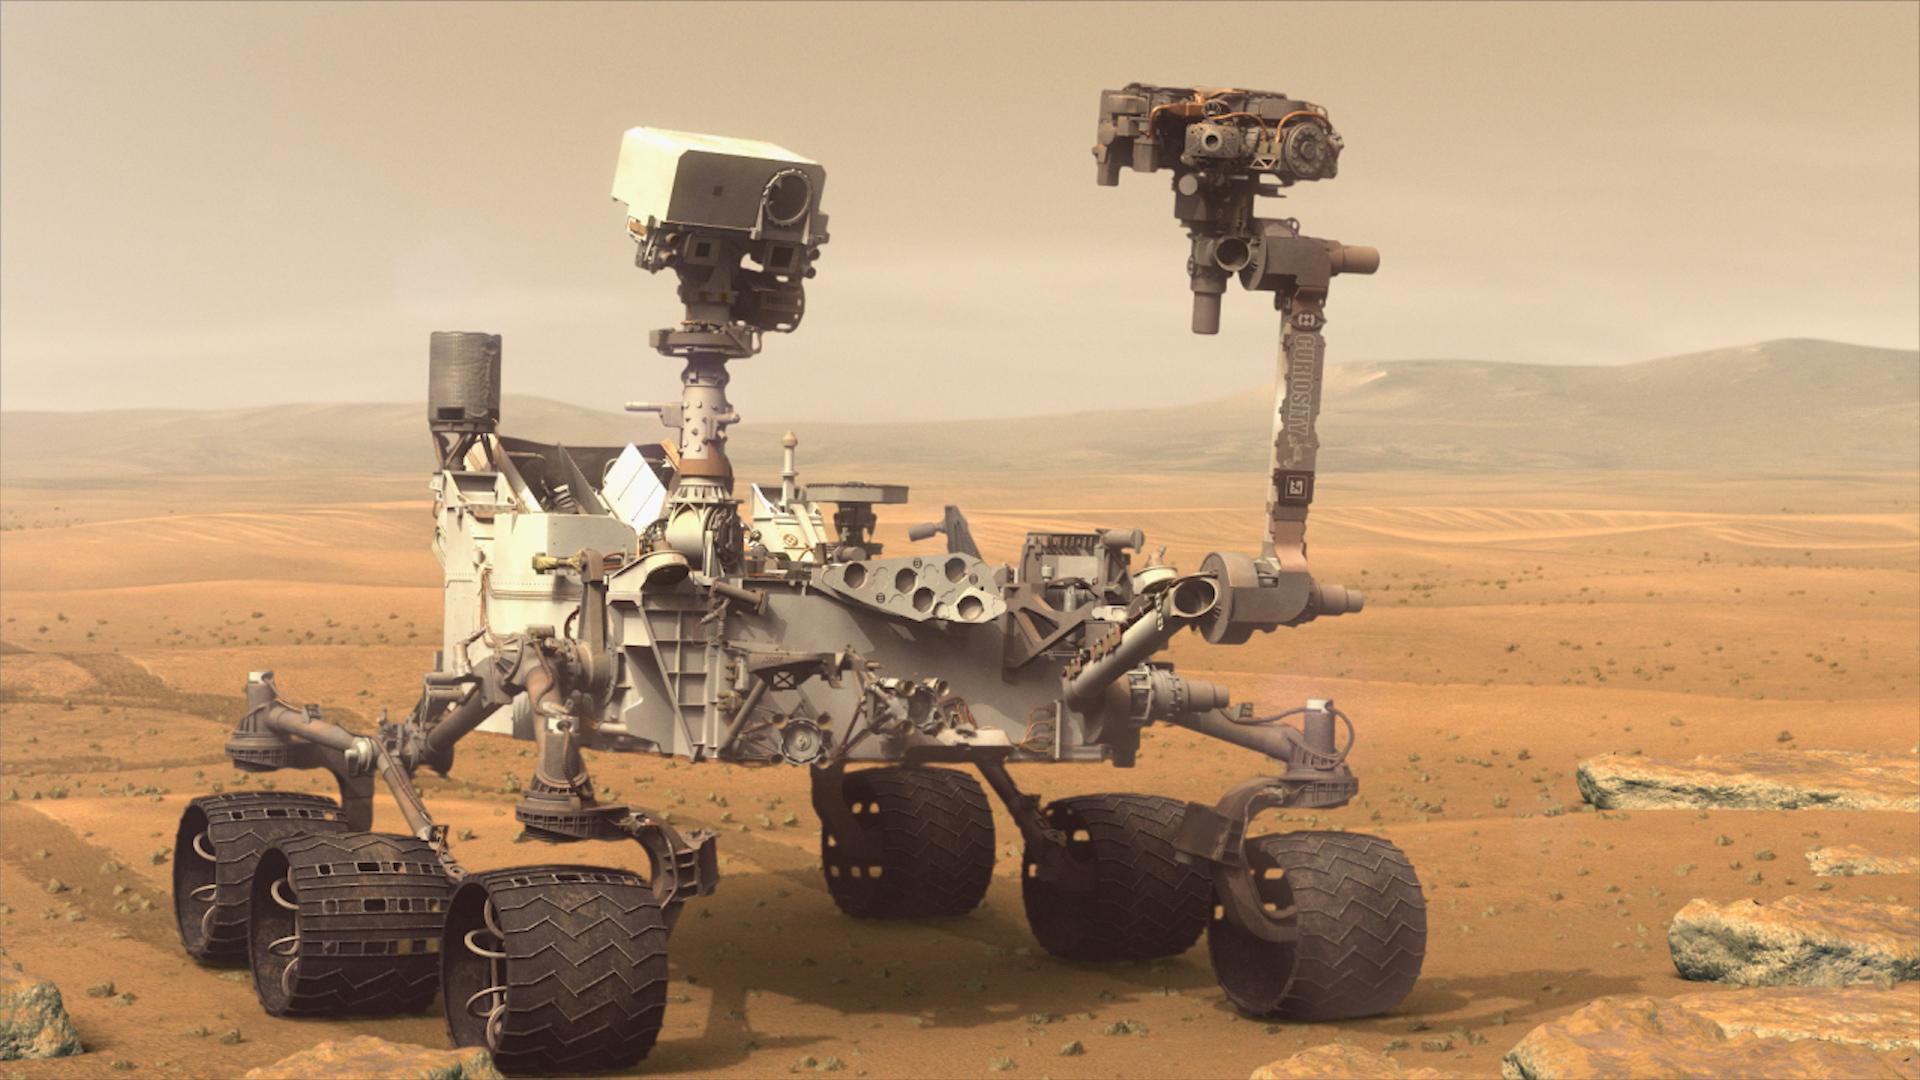 Caption: The Curiosity rover on Mars., Credit: NASA